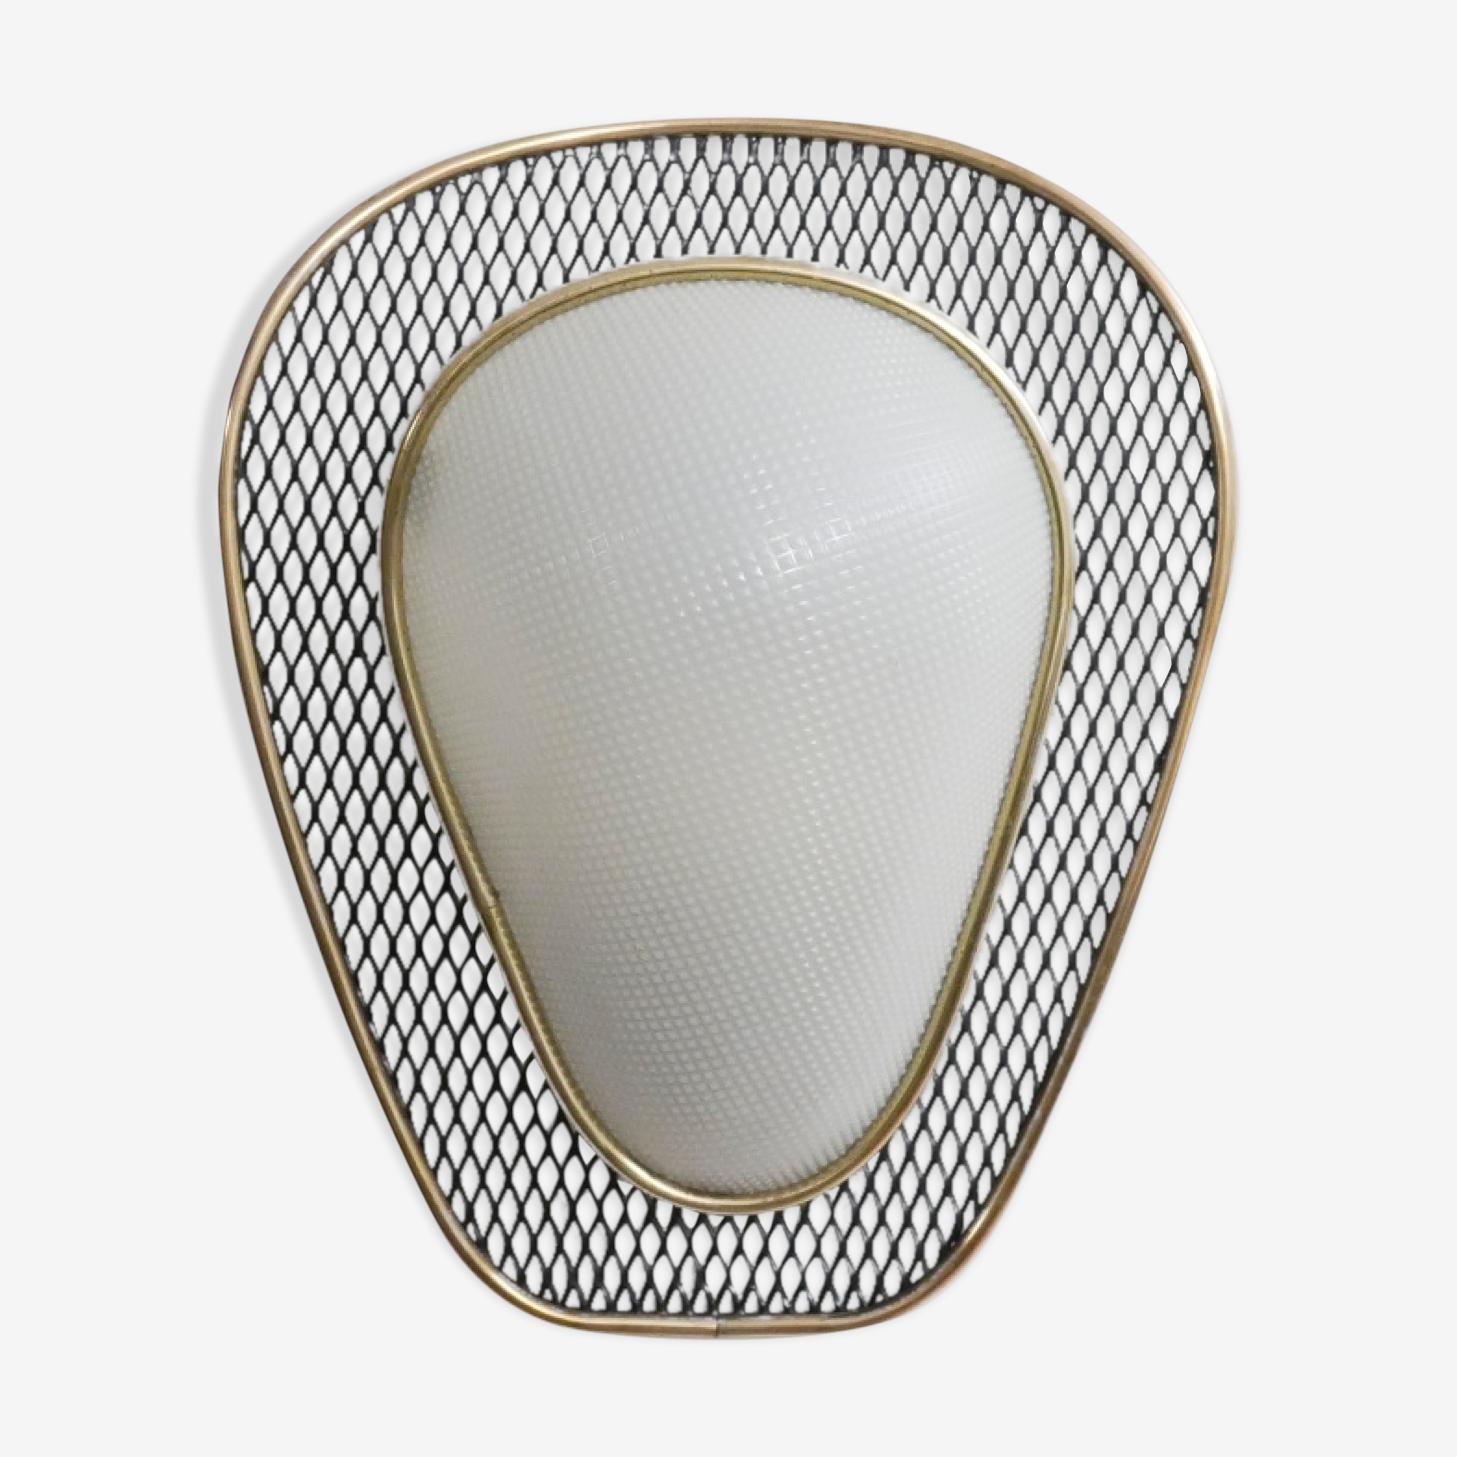 Wall lamp white & black perforated metal 1950